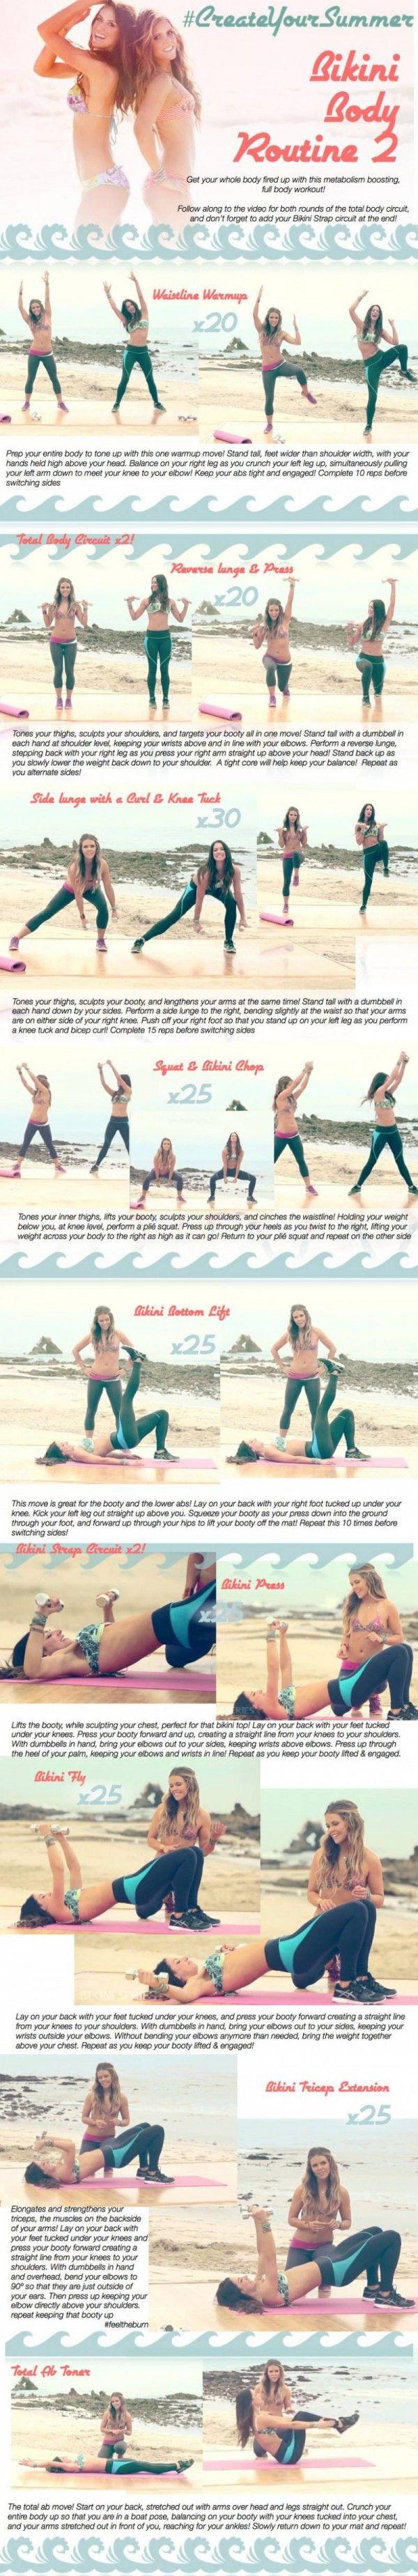 Total Body Workout 2! - Short, sweet, simple...feel that butt burn! WEEK 4 #BIKINISERIES Schedule!